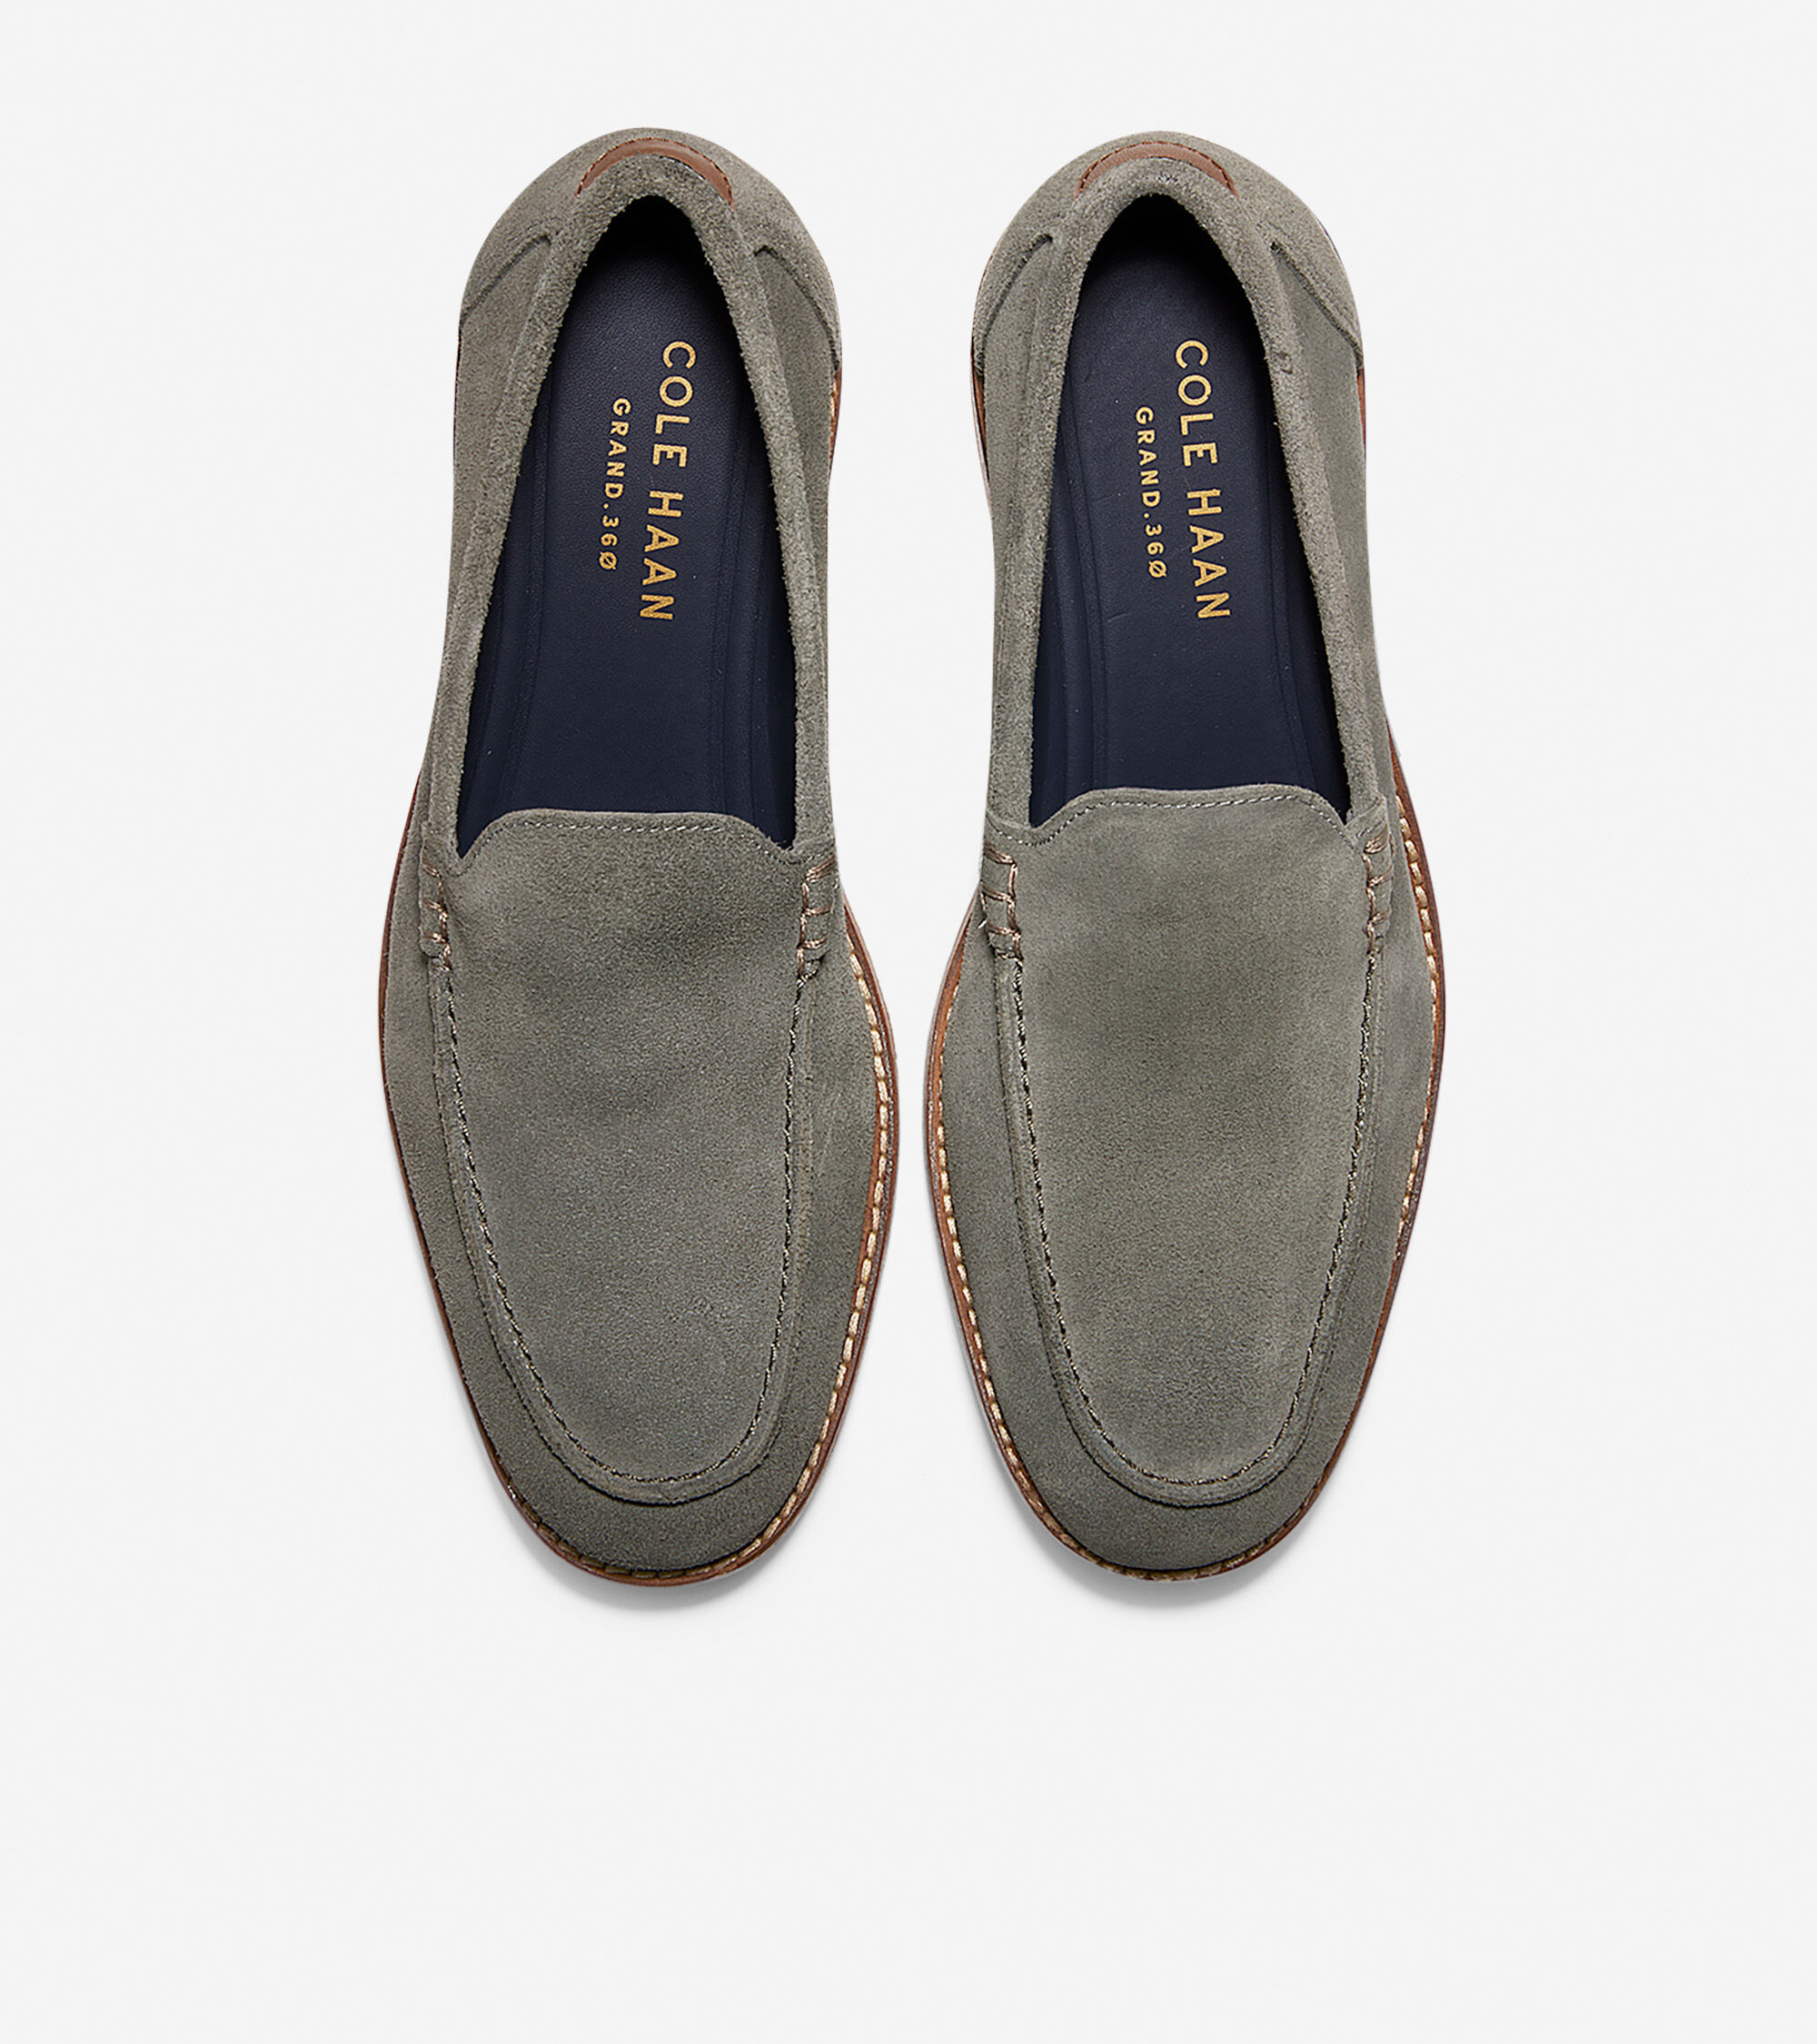 c8b98382d31 Men s Feathercraft Grand Venetian Loafers in Magnet